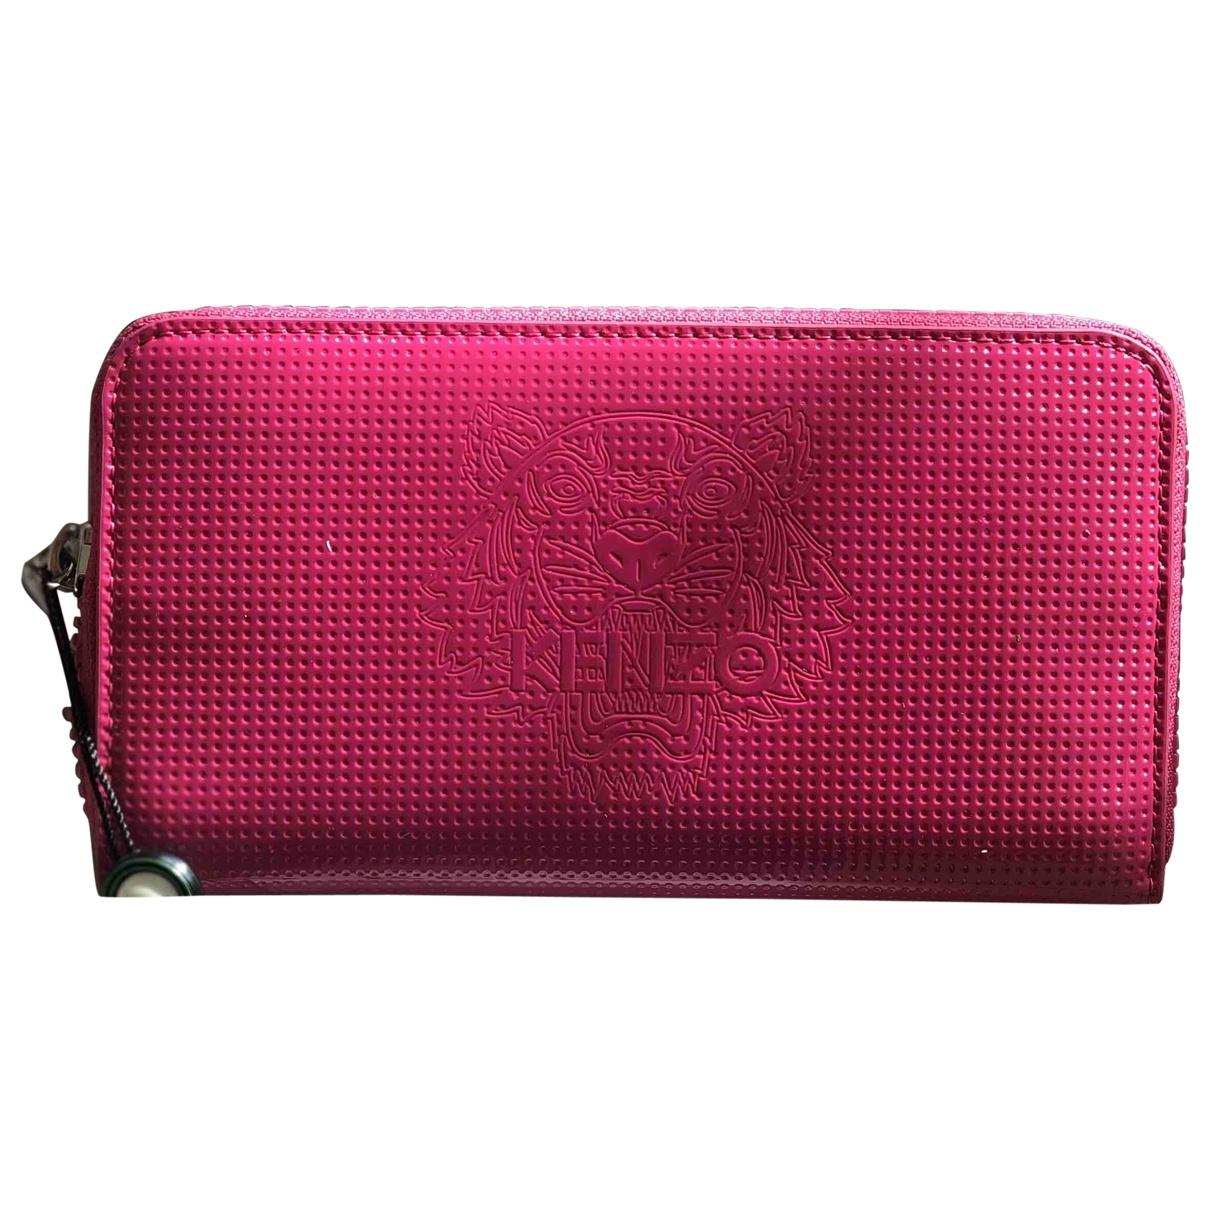 Kenzo \N Pink Leather wallet for Women \N